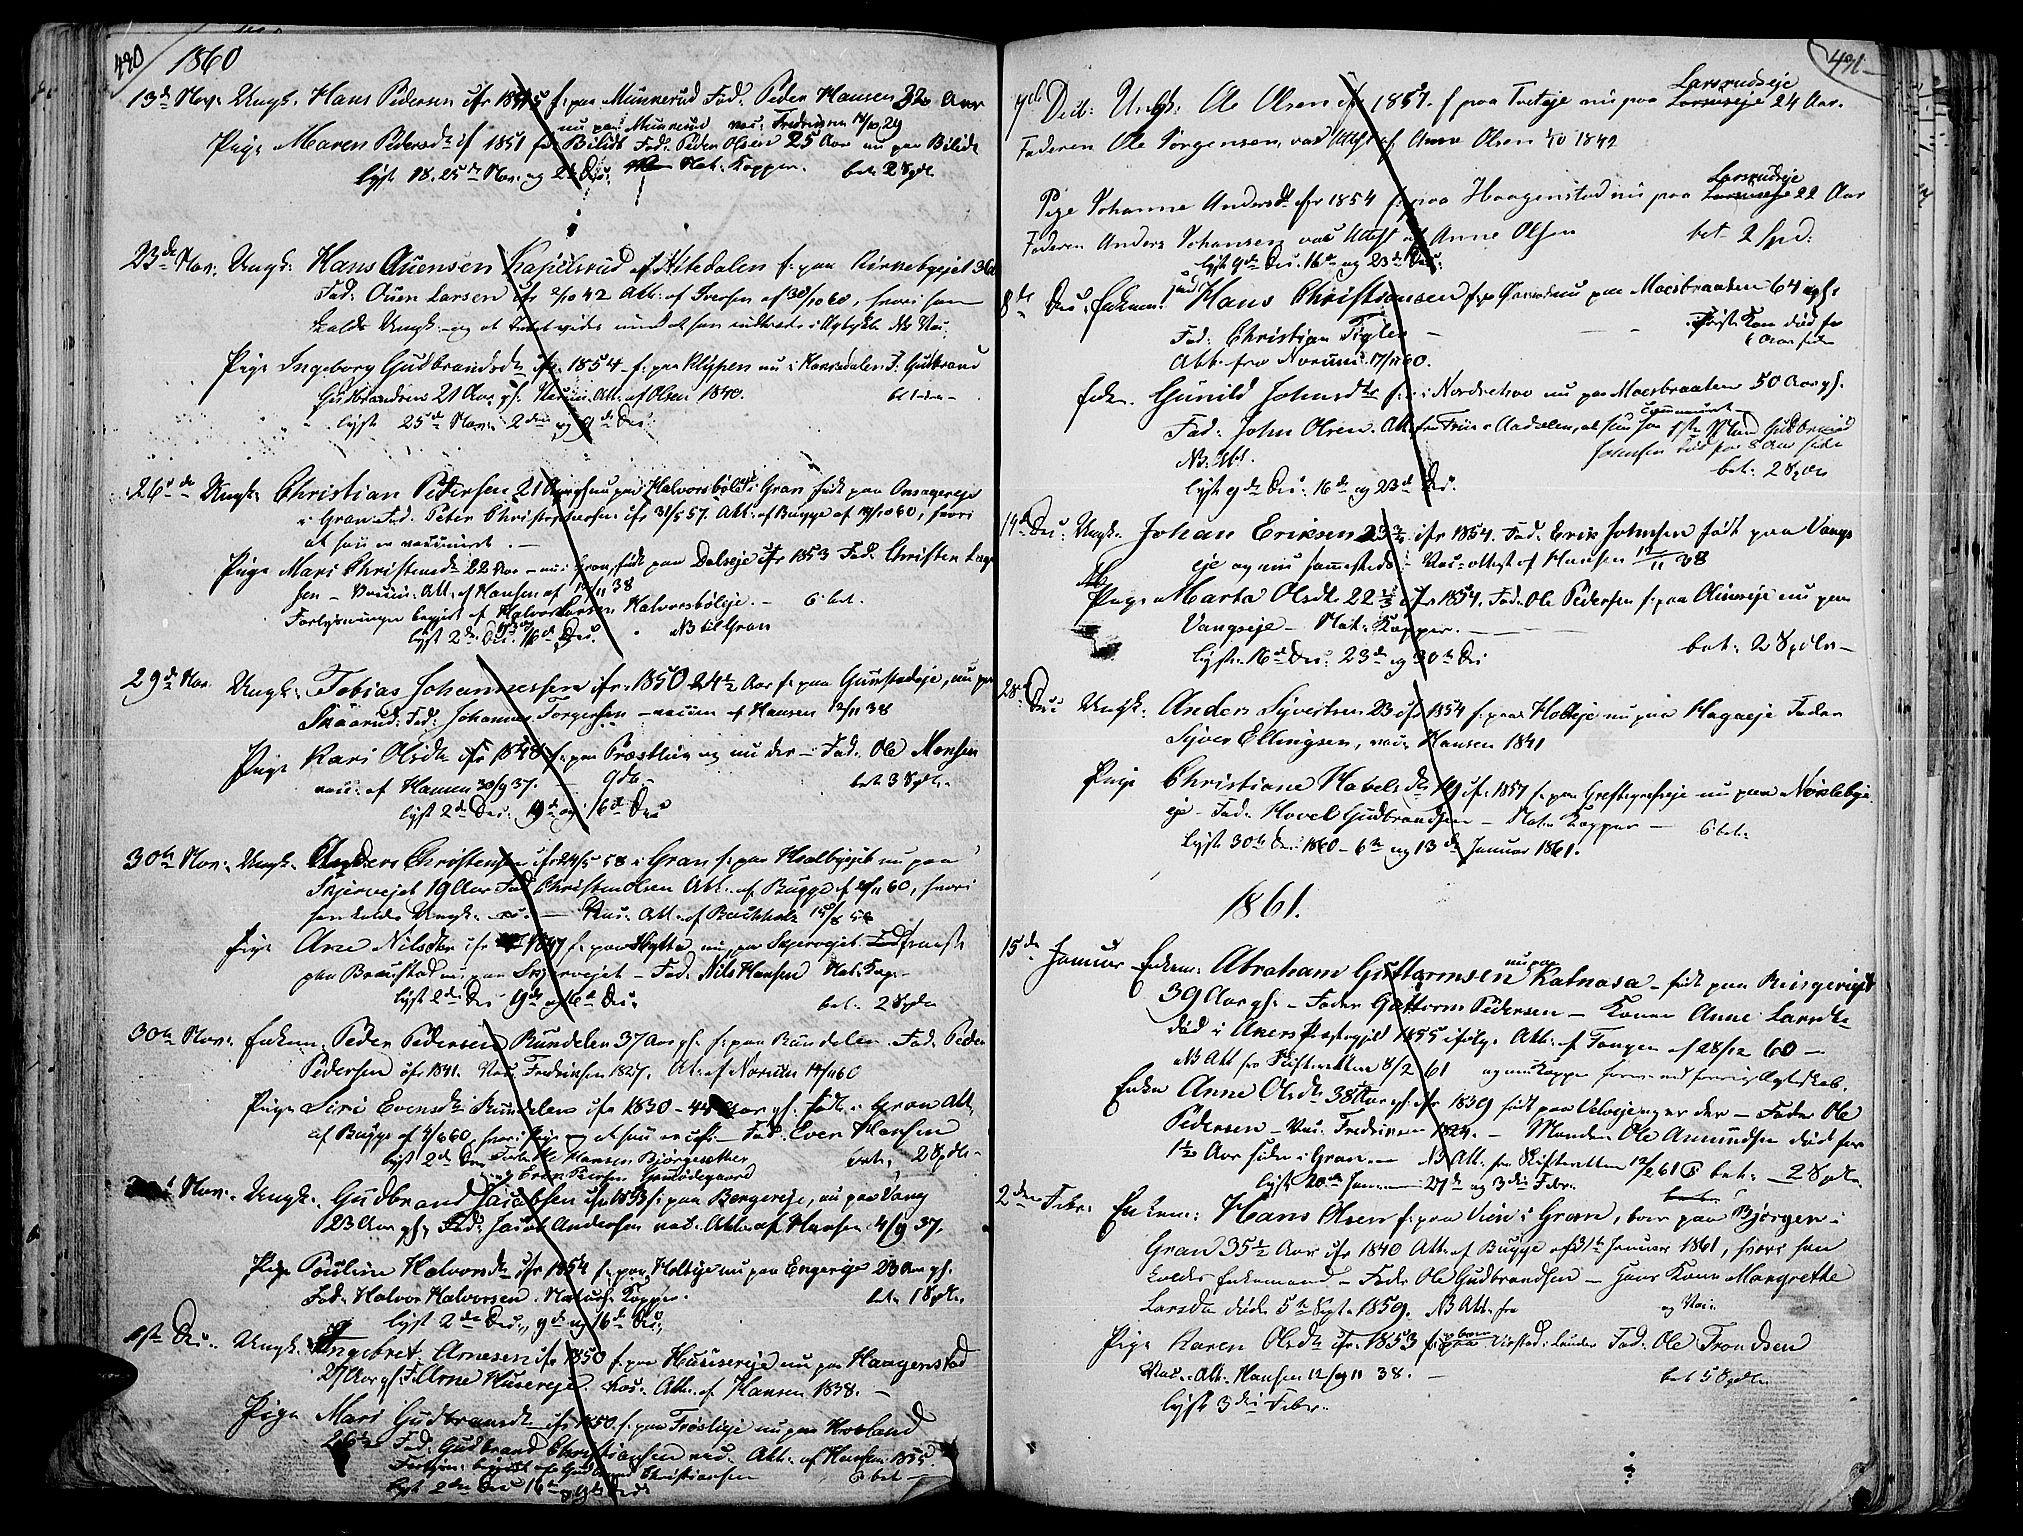 SAH, Jevnaker prestekontor, Ministerialbok nr. 4, 1800-1861, s. 430-431